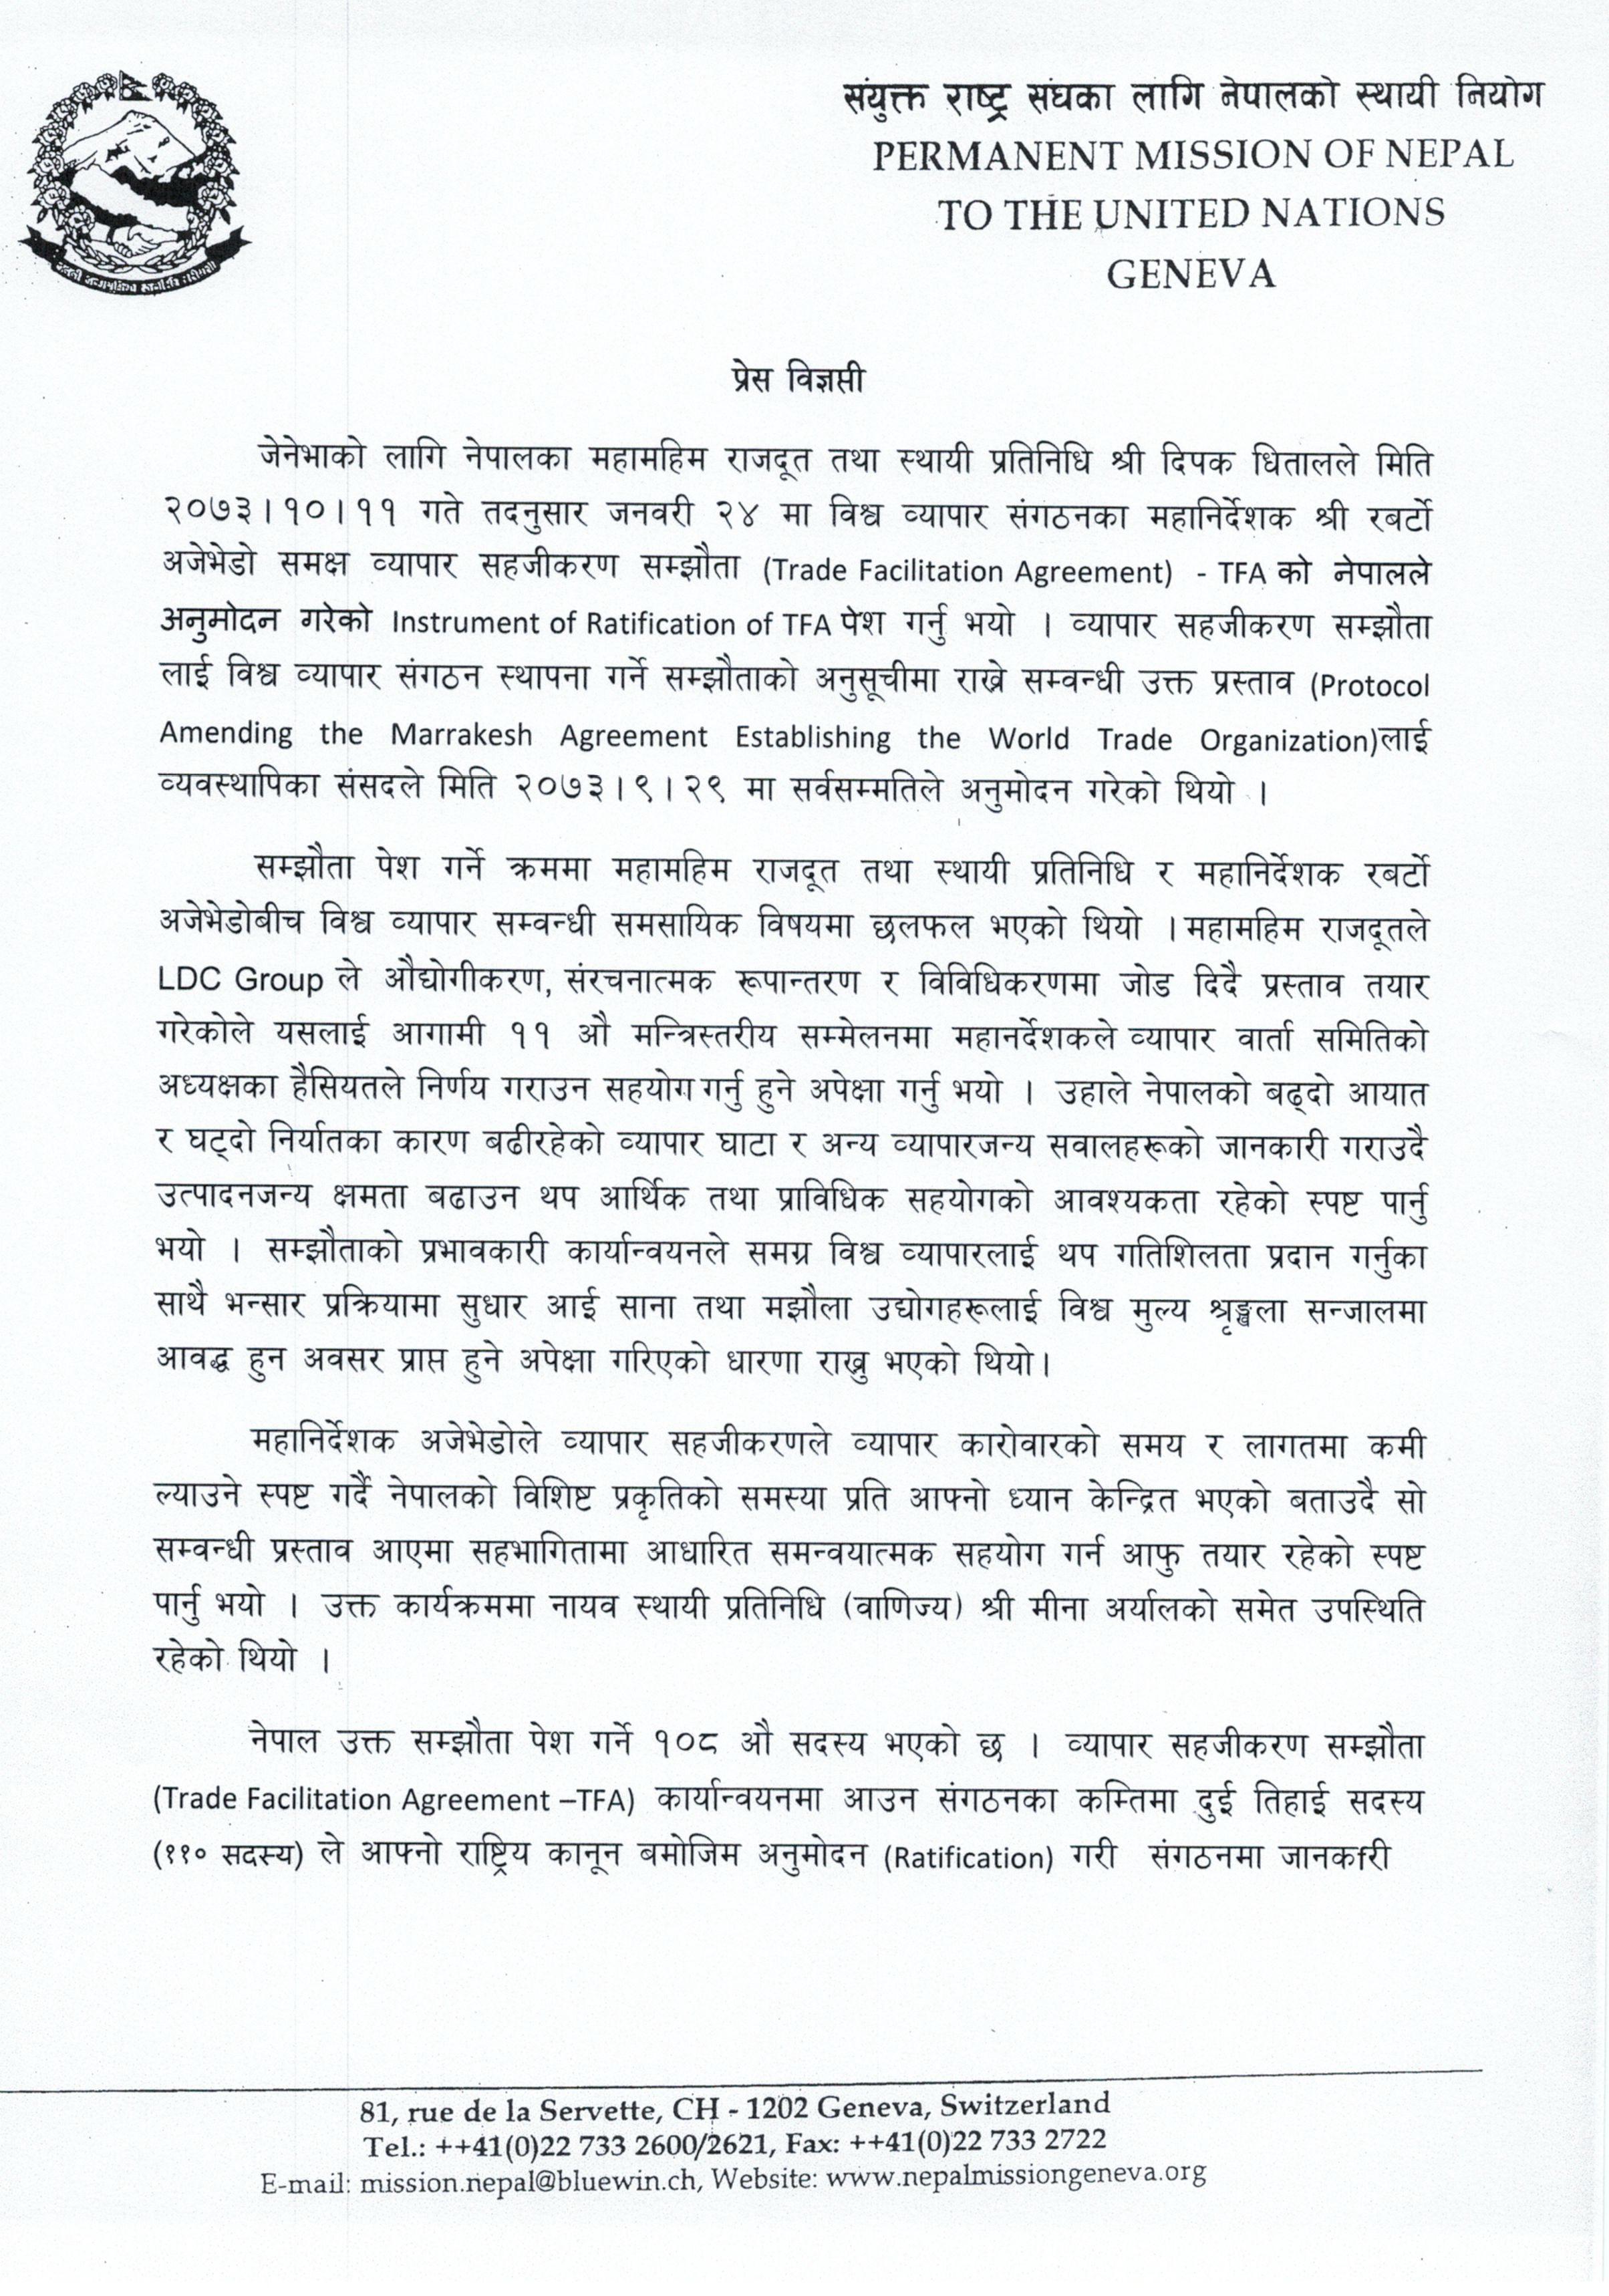 Press Release Regarding Instrument Of Ratification Of Trade